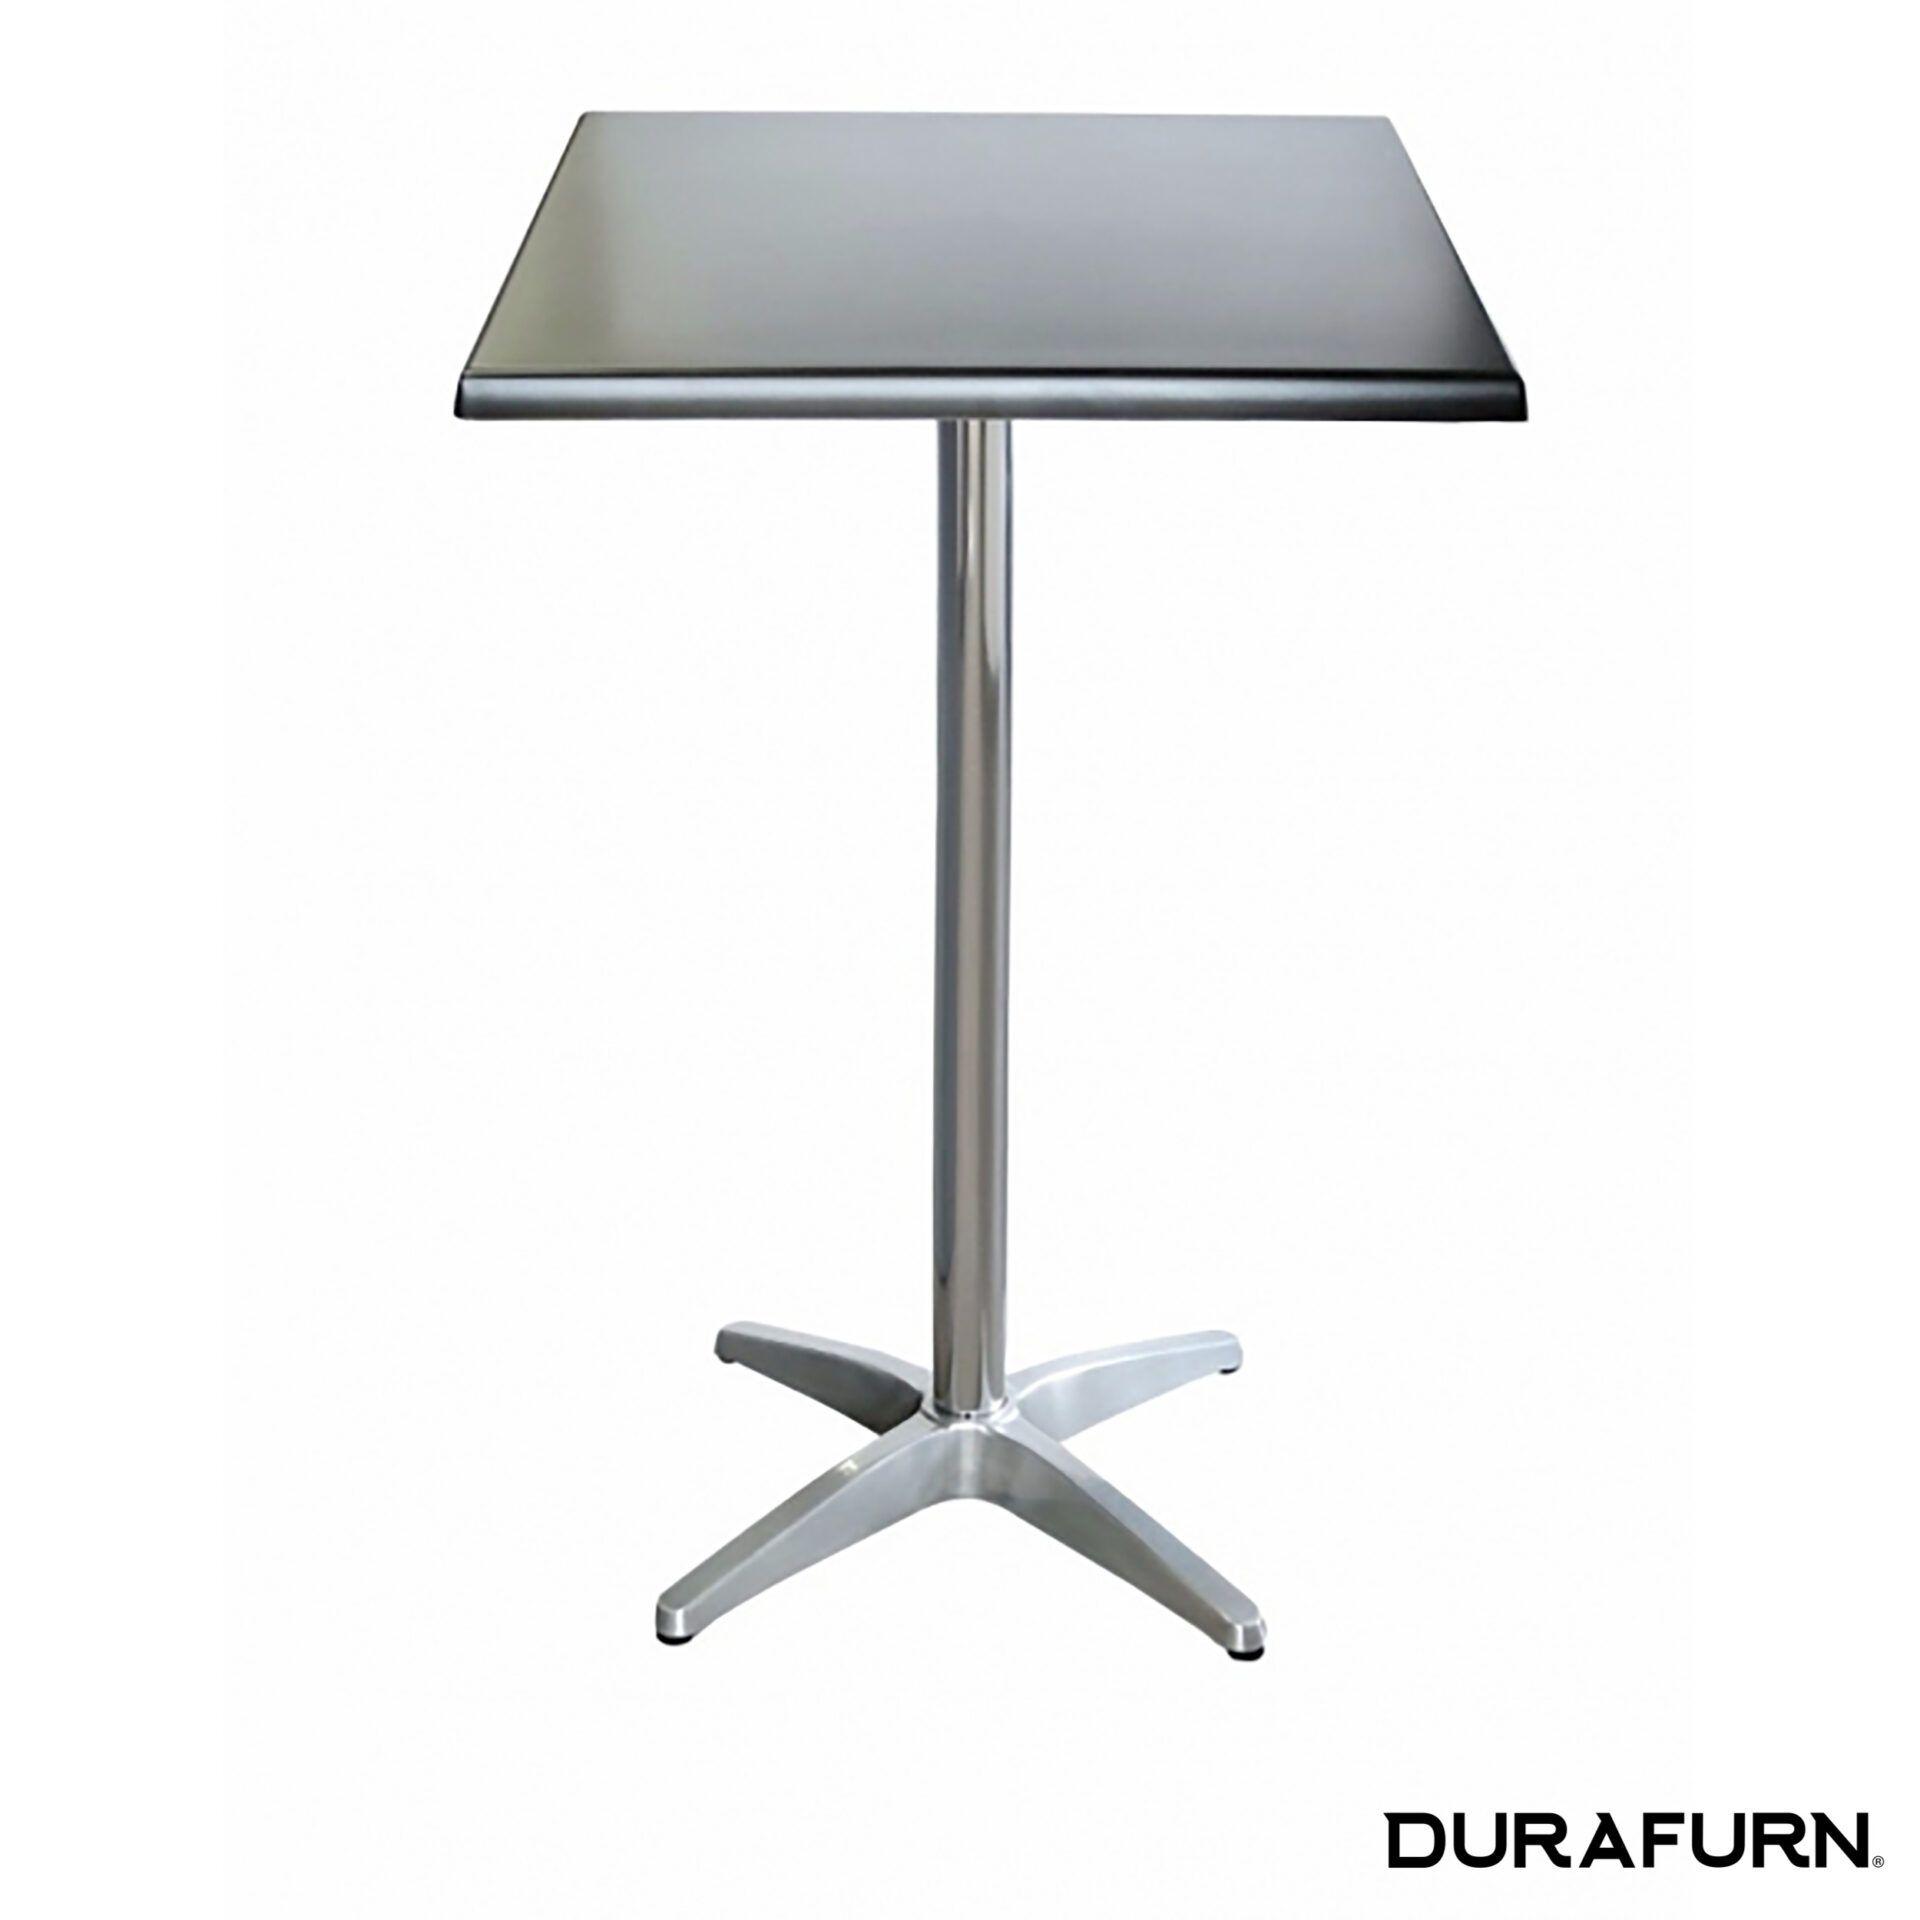 astoria aluminium bar height table base square tableo2to32